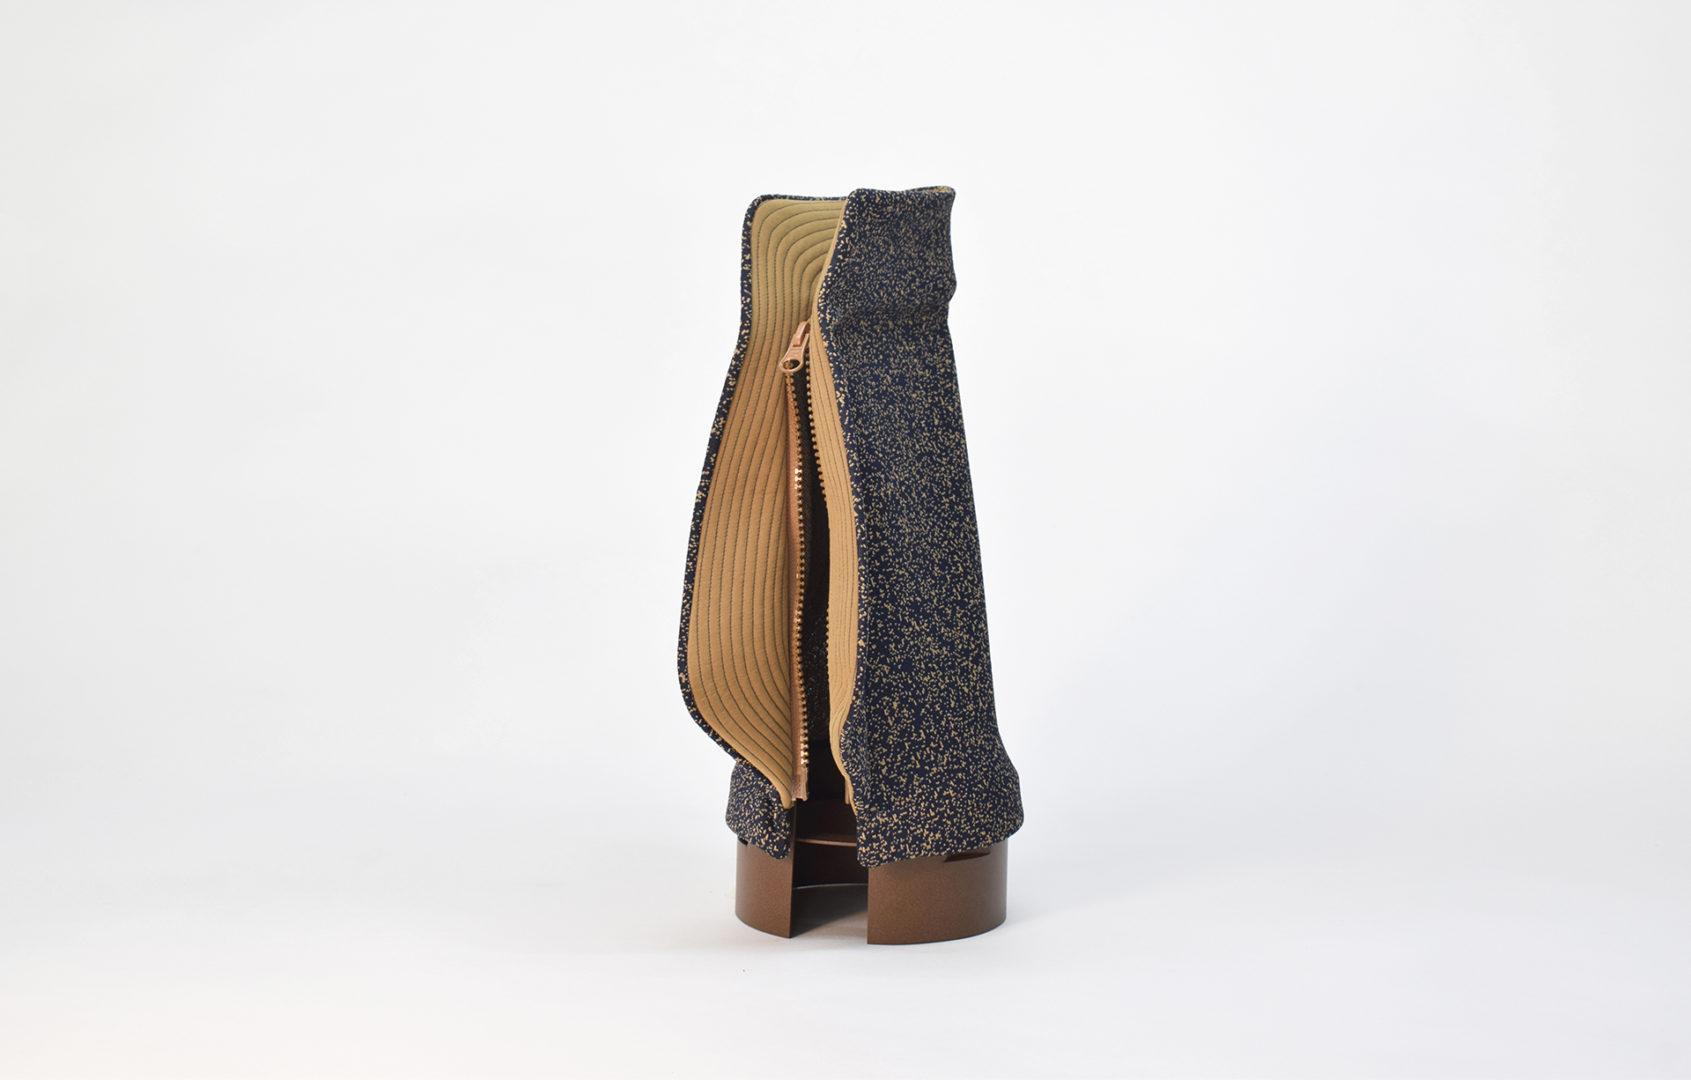 Muette-lamp-brown-Yvan-Caillaud-3